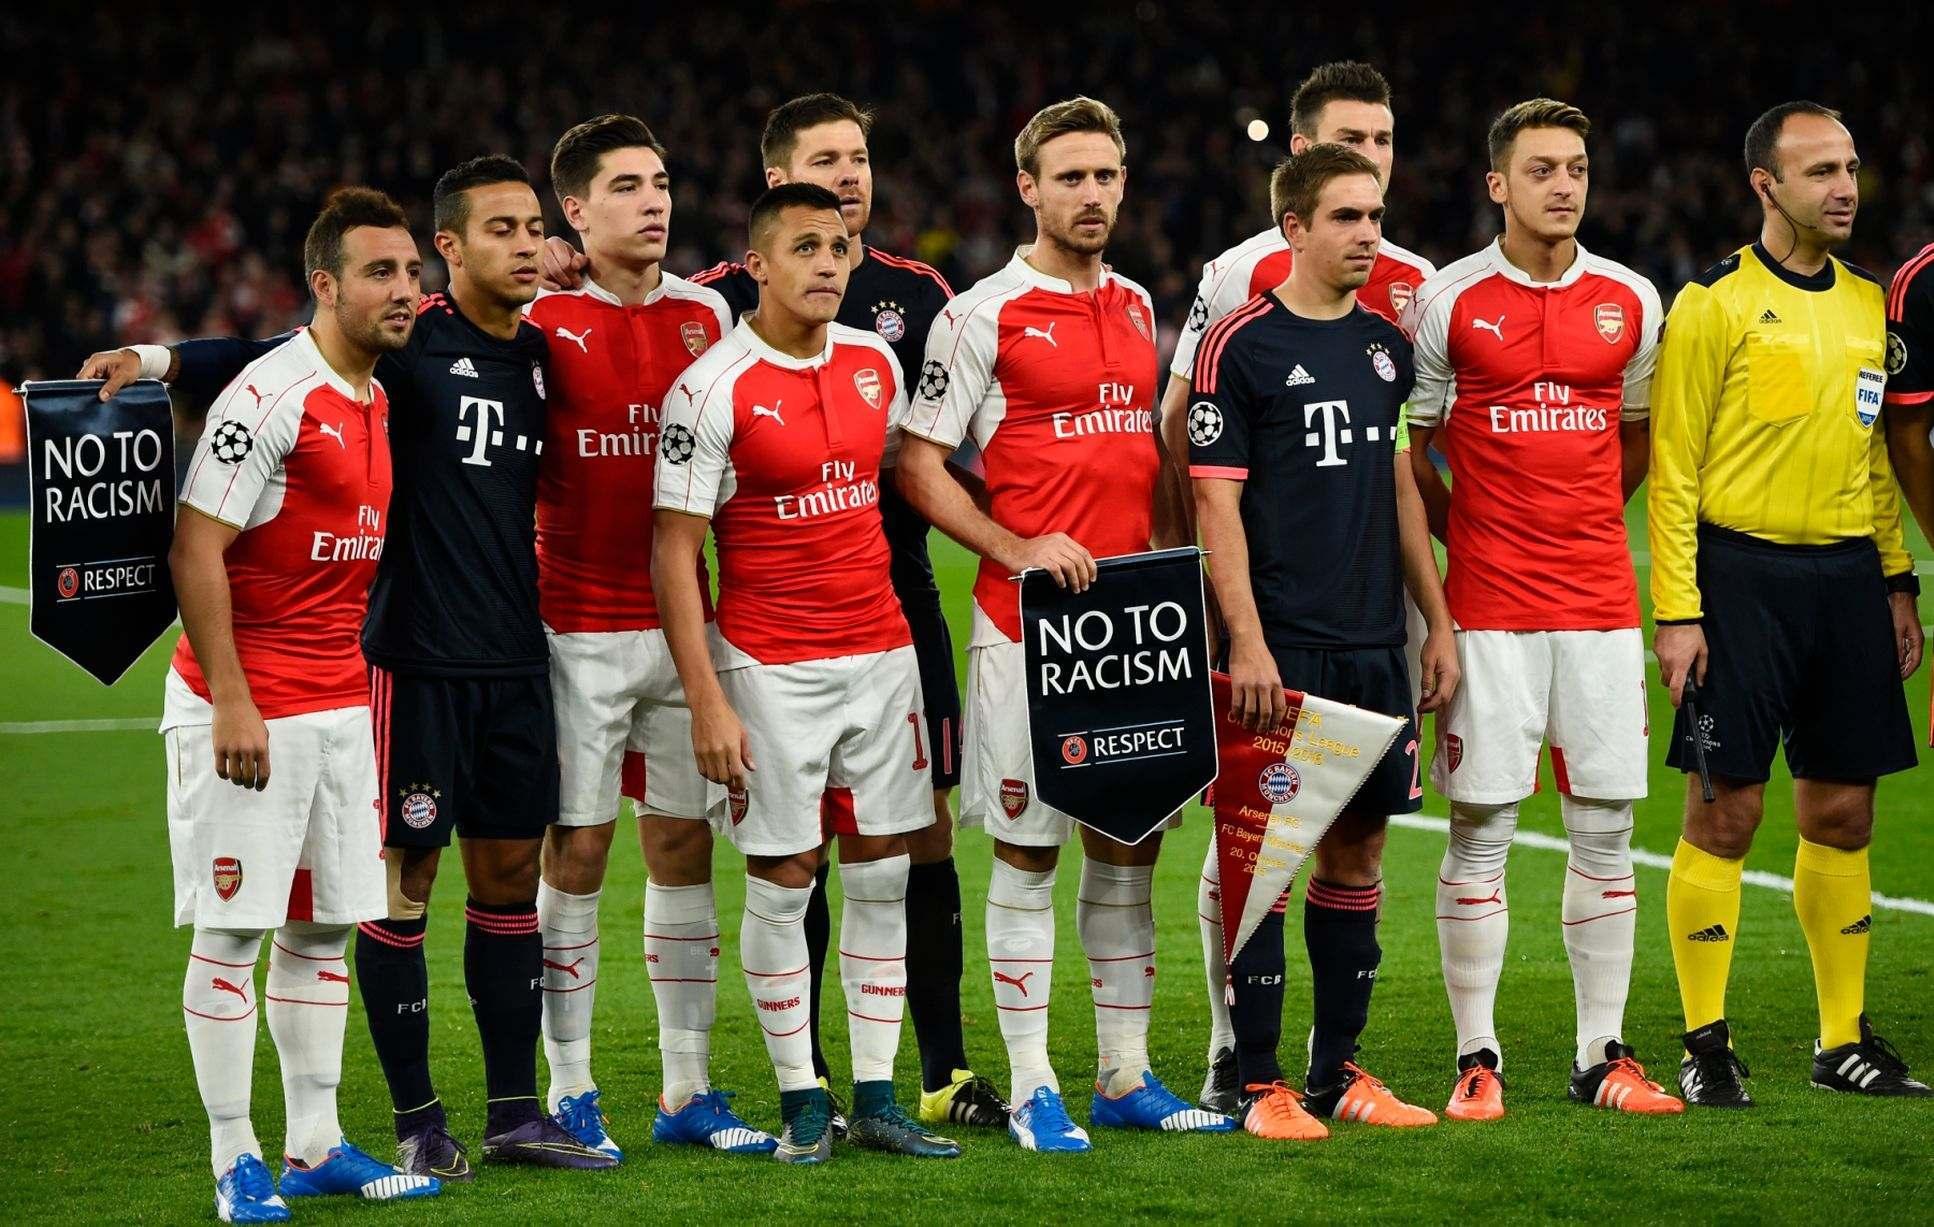 Prediksi Skor Bayern Munchen vs Arsenal 19 Juli 2017